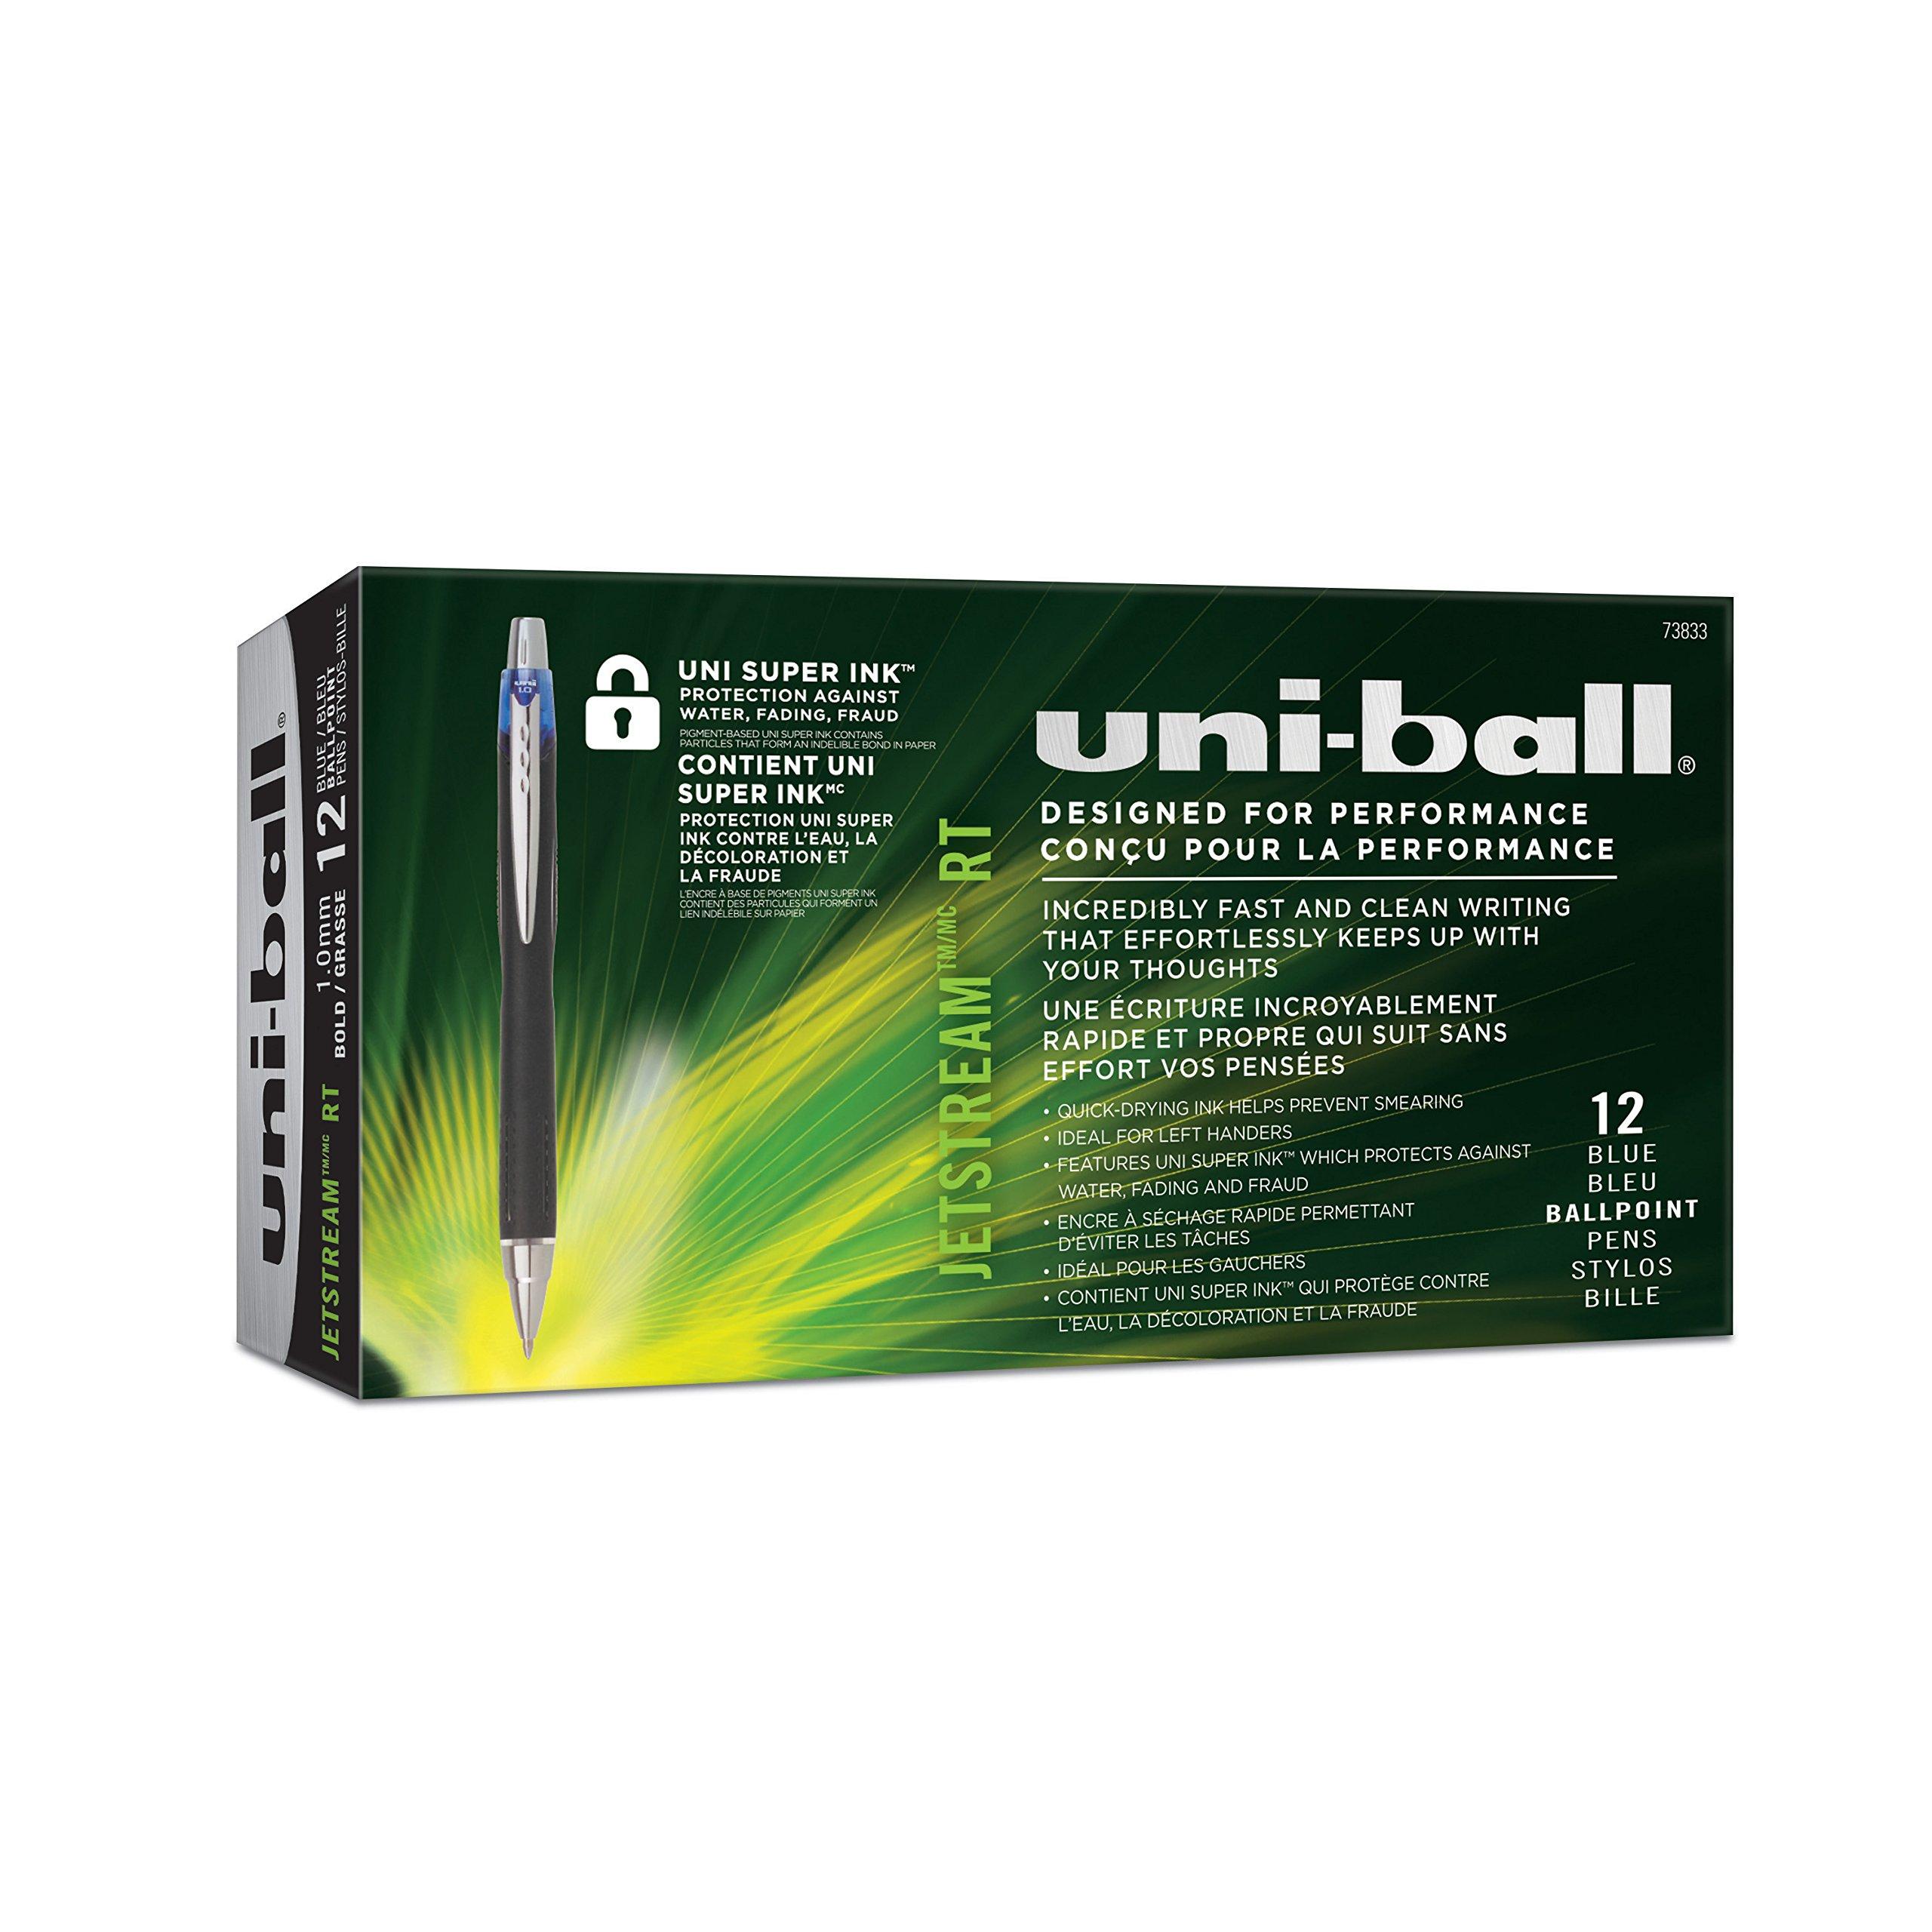 uni-ball Jetstream RT Ballpoint Pens, Bold Point (1.0mm), Blue, 12 Count by Uni-ball (Image #8)